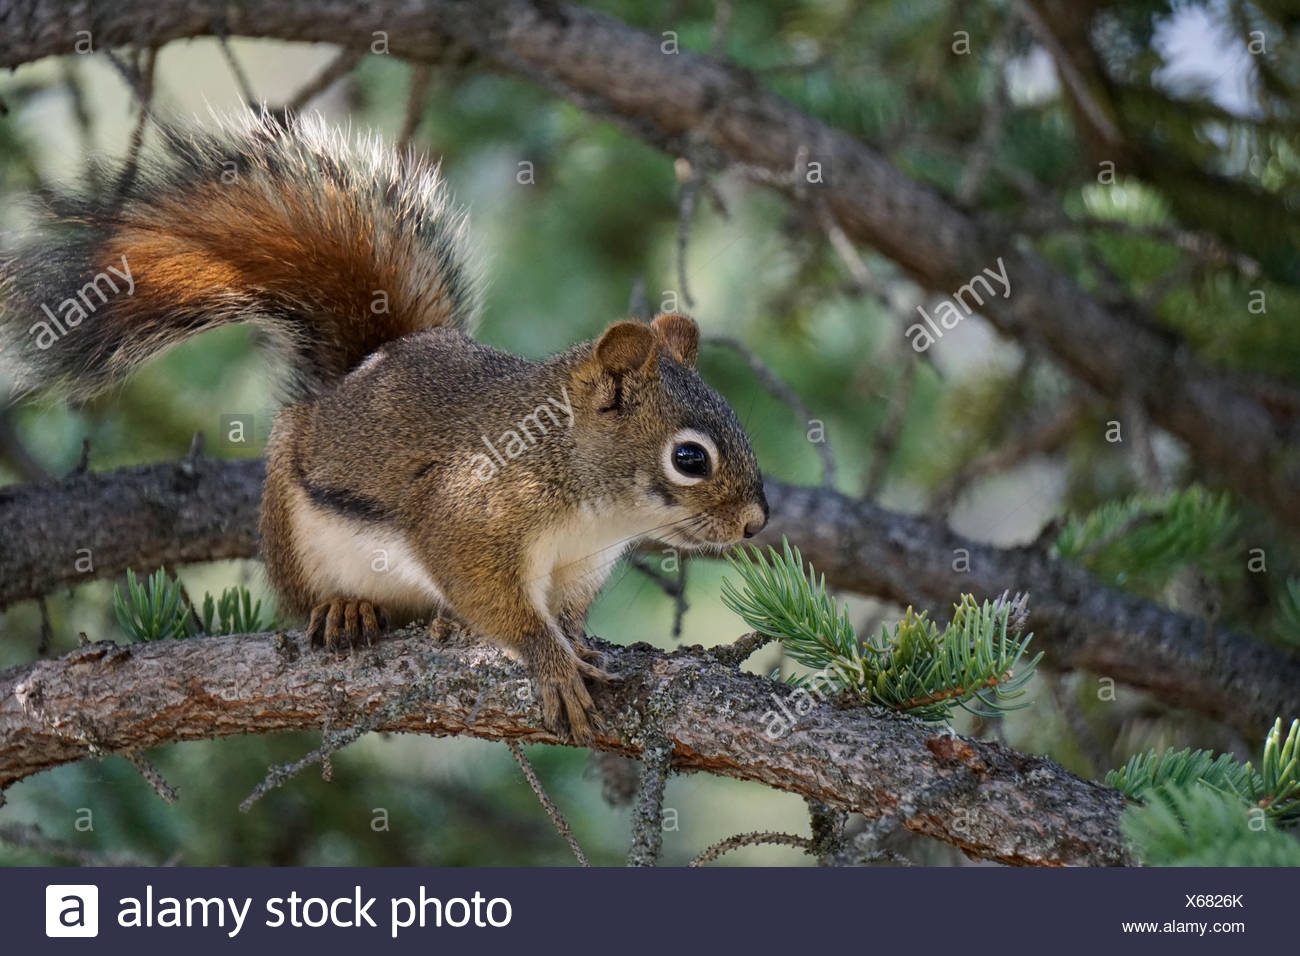 Kanada, Alberta, Banff National Park, Banff, Hörnchen, Rothörnchen, American Red Squirrel - Stock Image